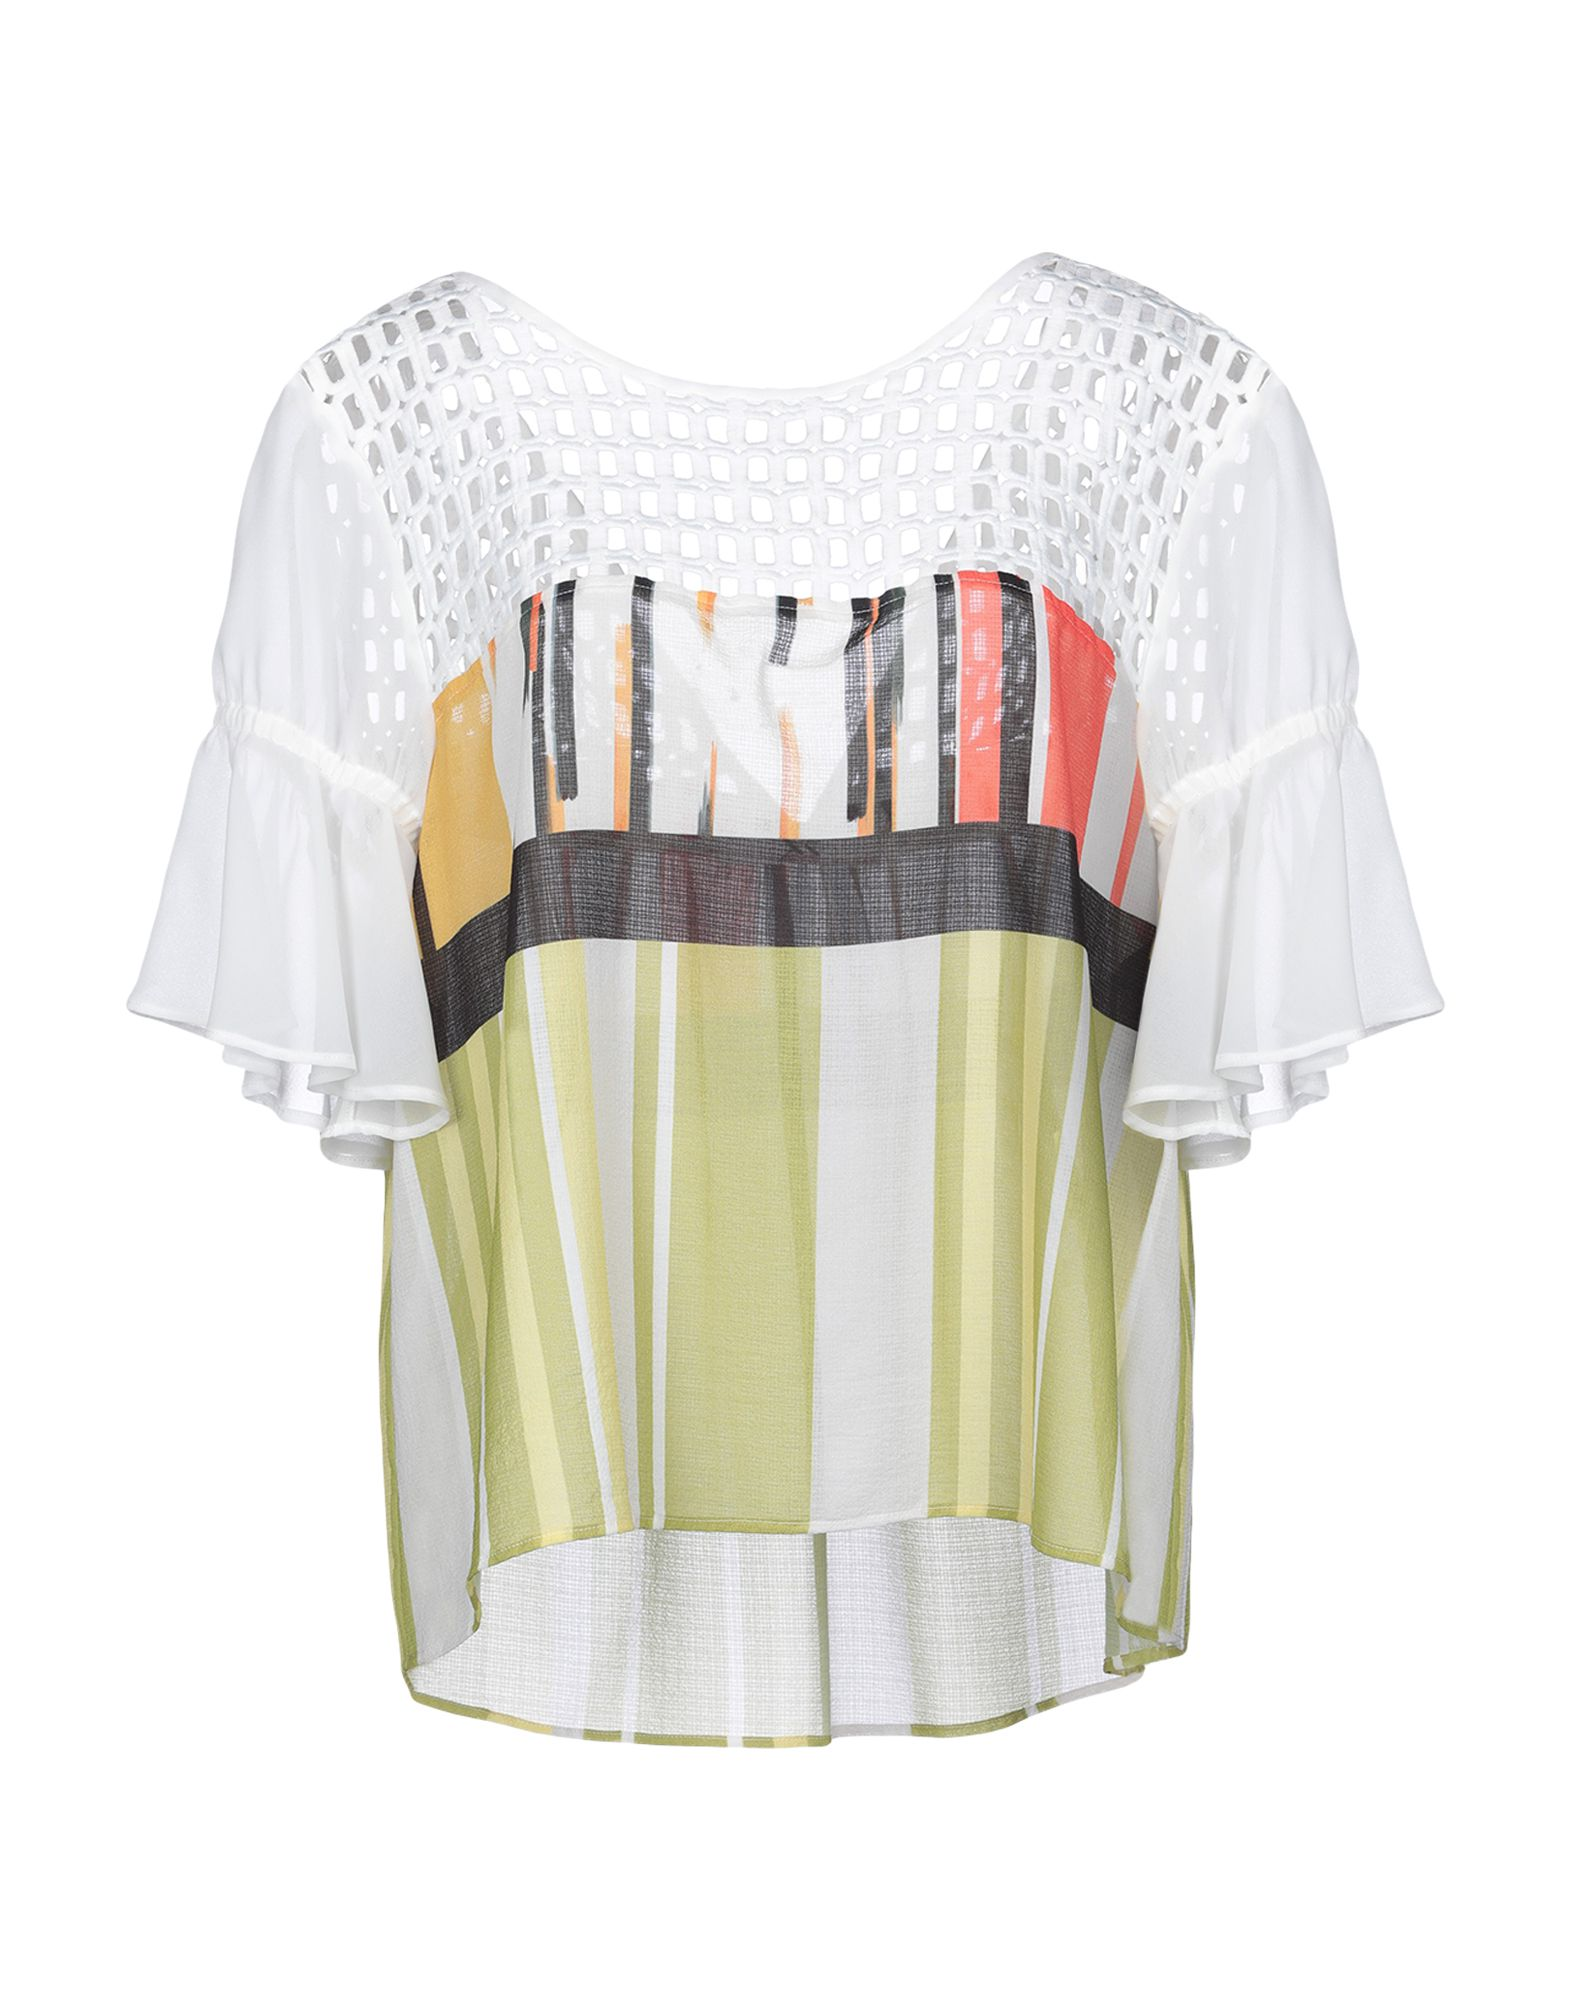 X'S MILANO Блузка lucky lu milano блузка